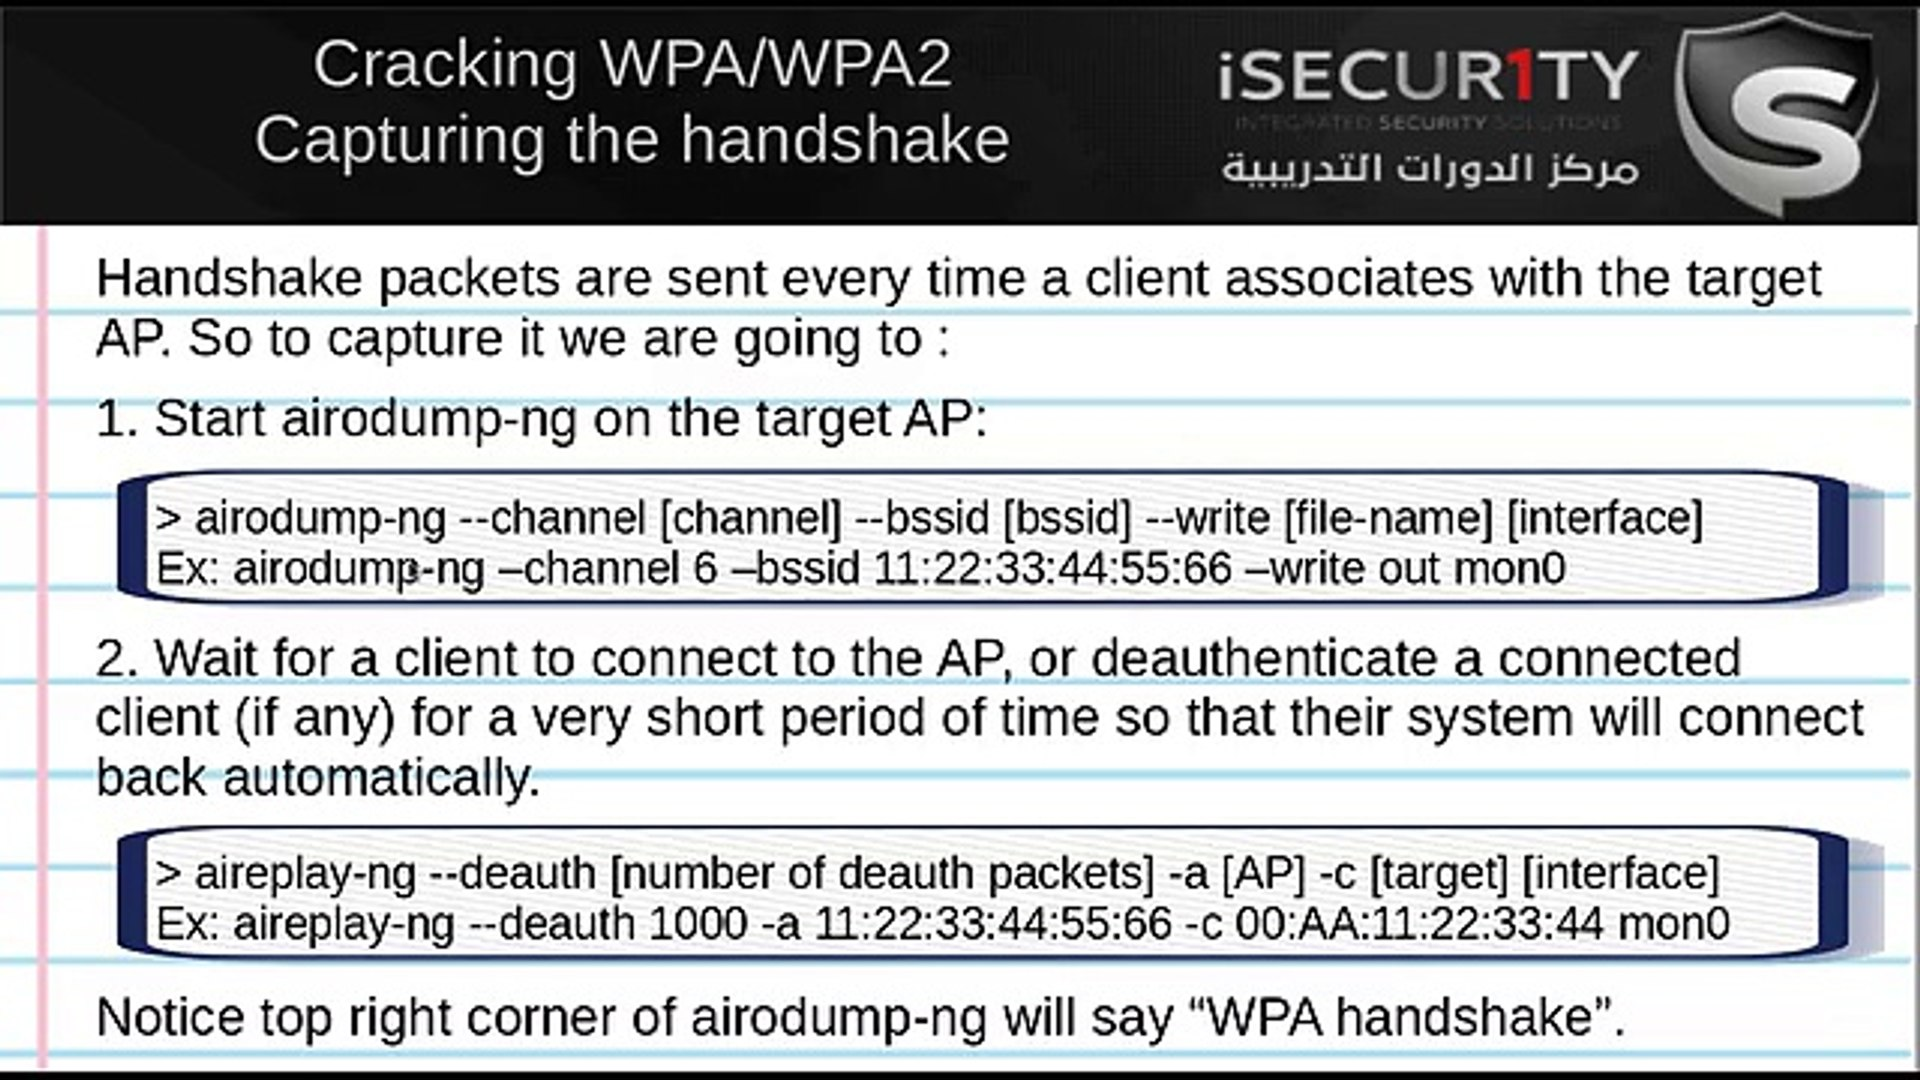 23 WPA Cracking - How to Capture the Handshake